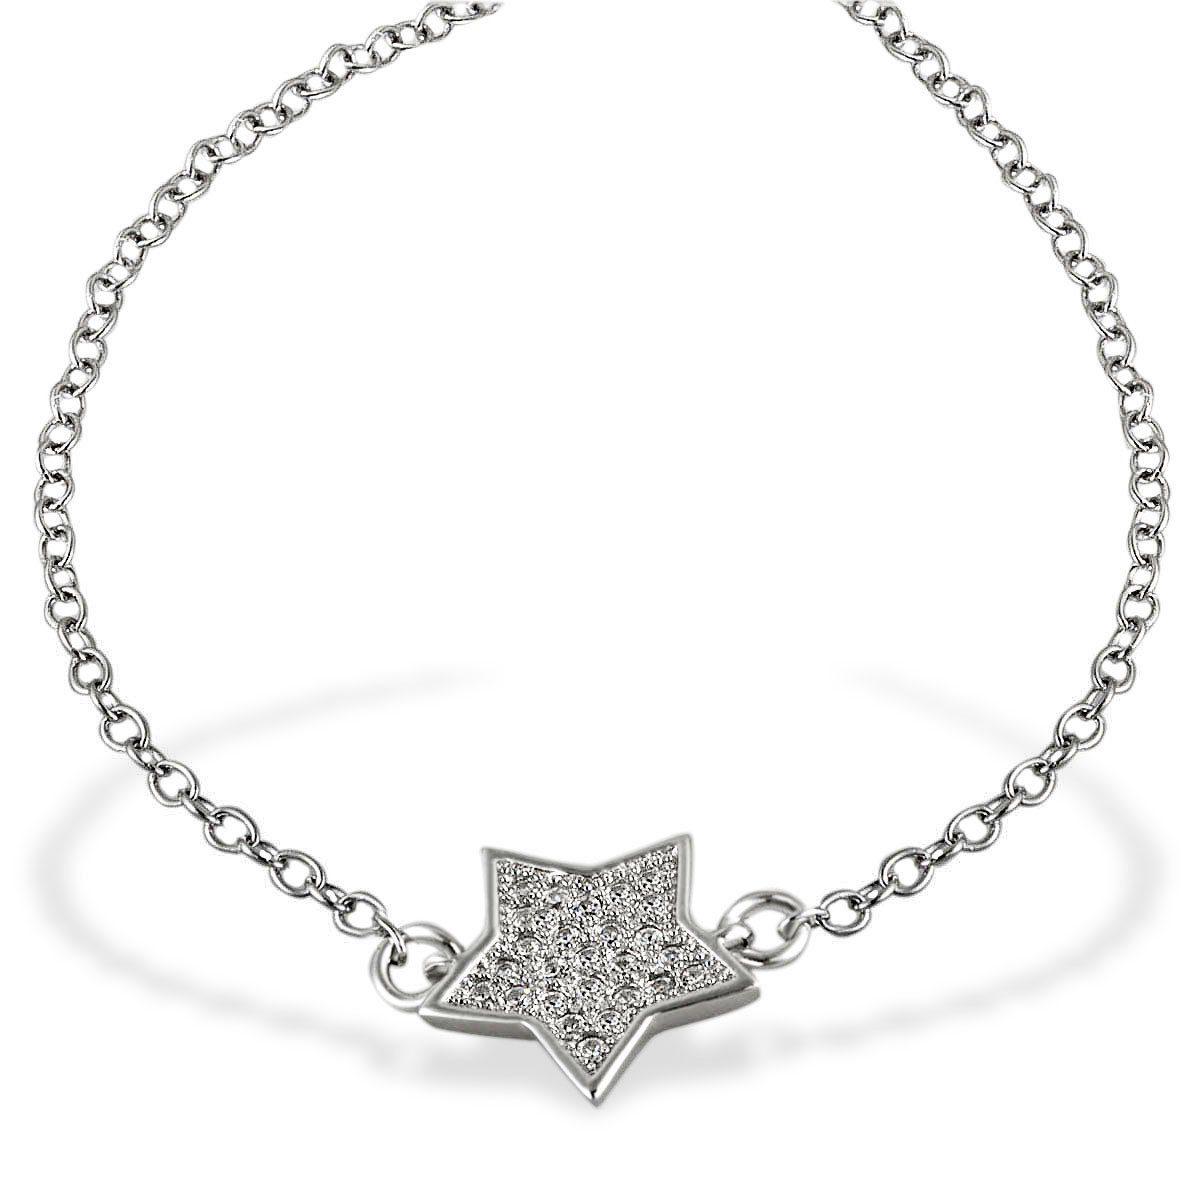 Averdin Armband Stern 925 Sterlingsilber 26 weiße Zirkonia 19,5 cm